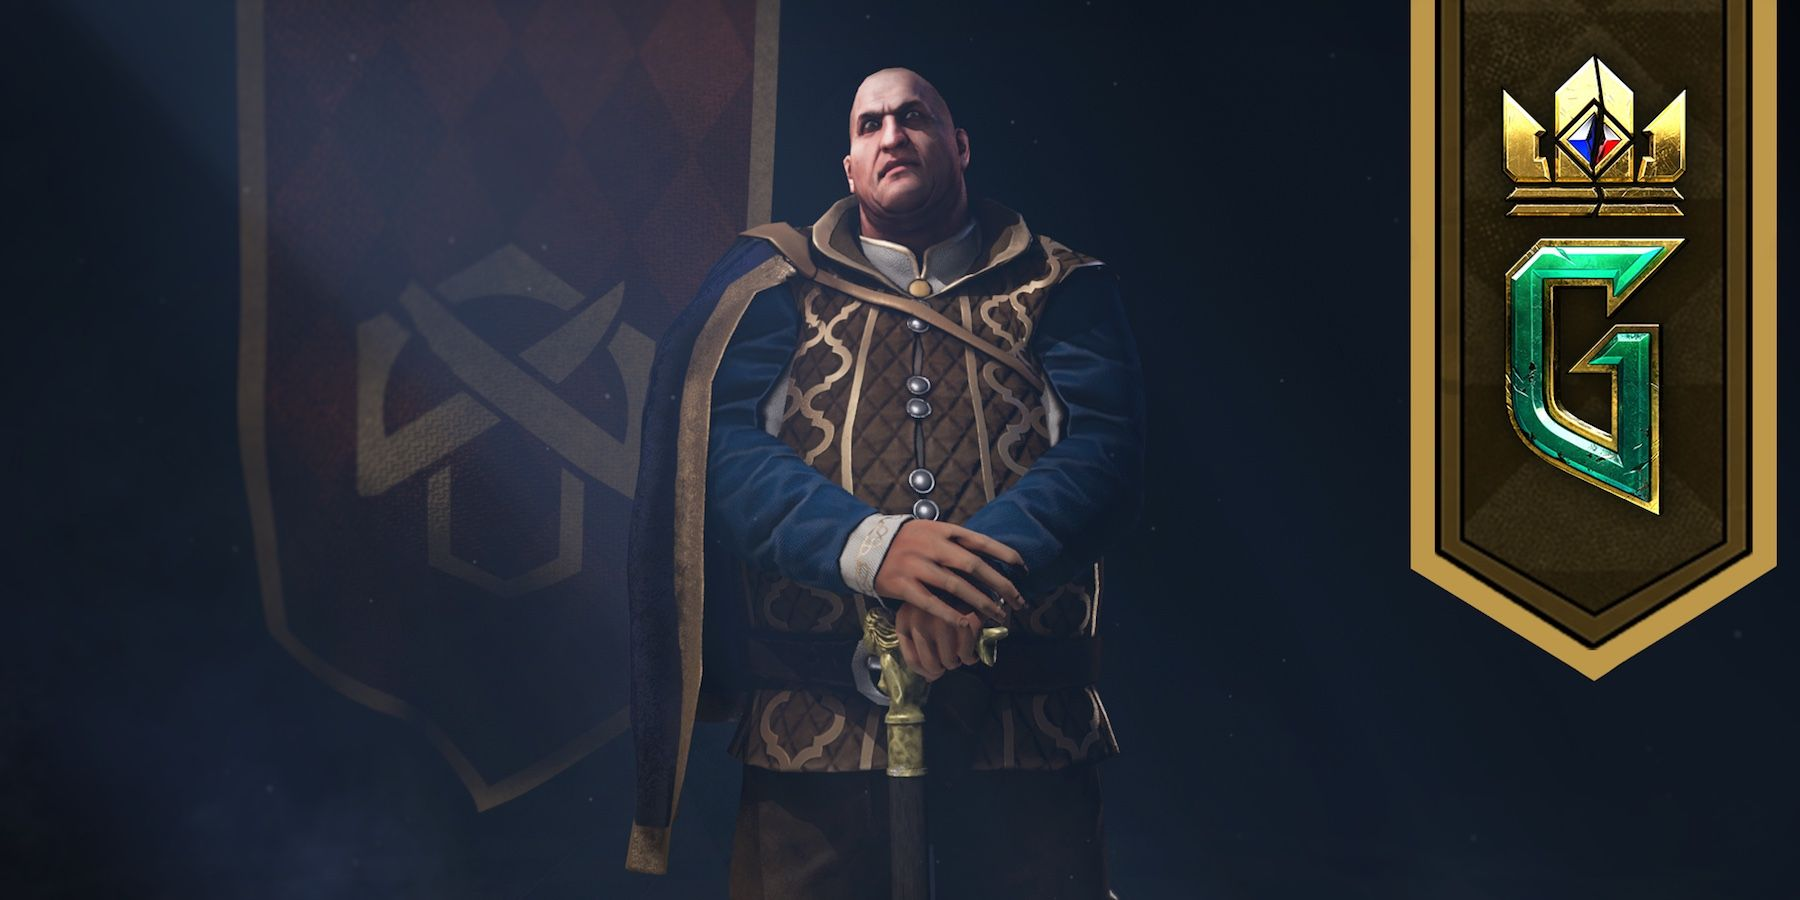 Witcher Season 2 Audition Tape Hints At Sigismund Dijkstra Casting